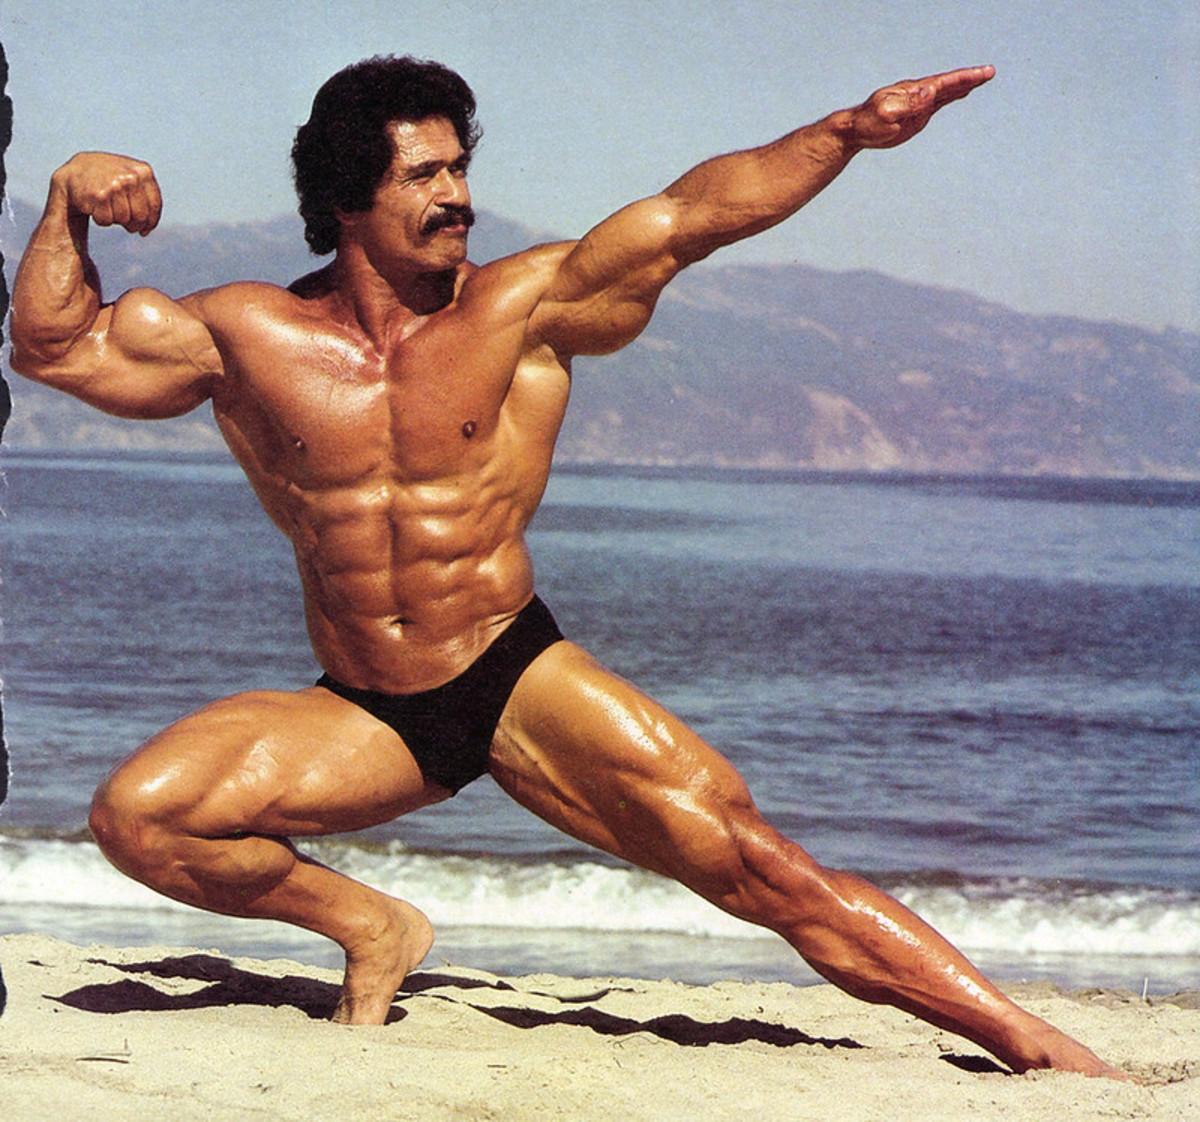 bodybuilder-or-crossfit-which-is-best